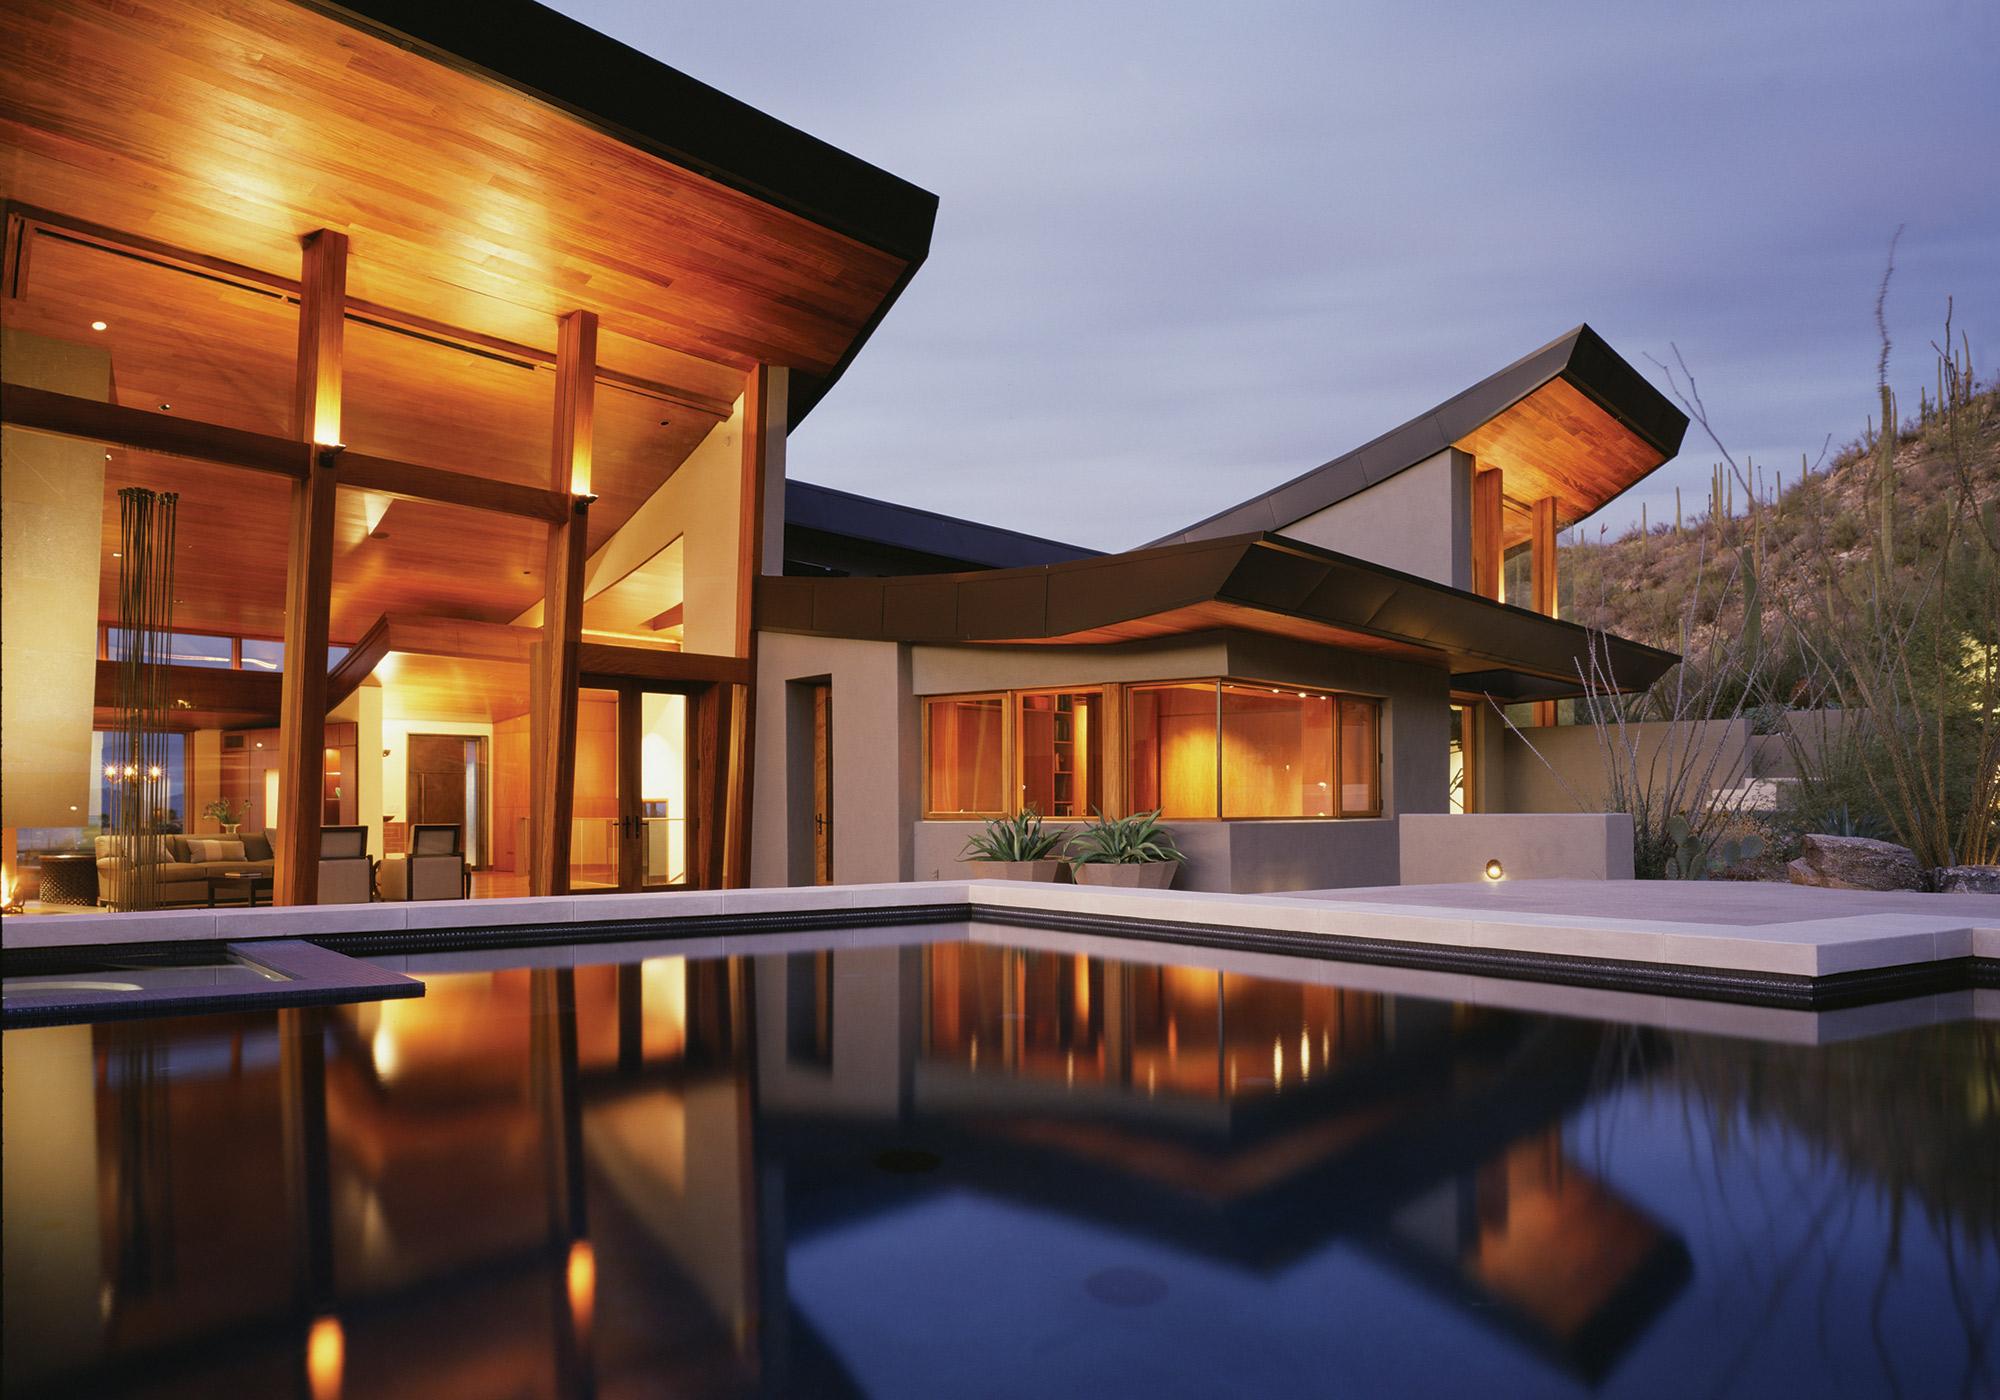 House in Tucson, Arizona